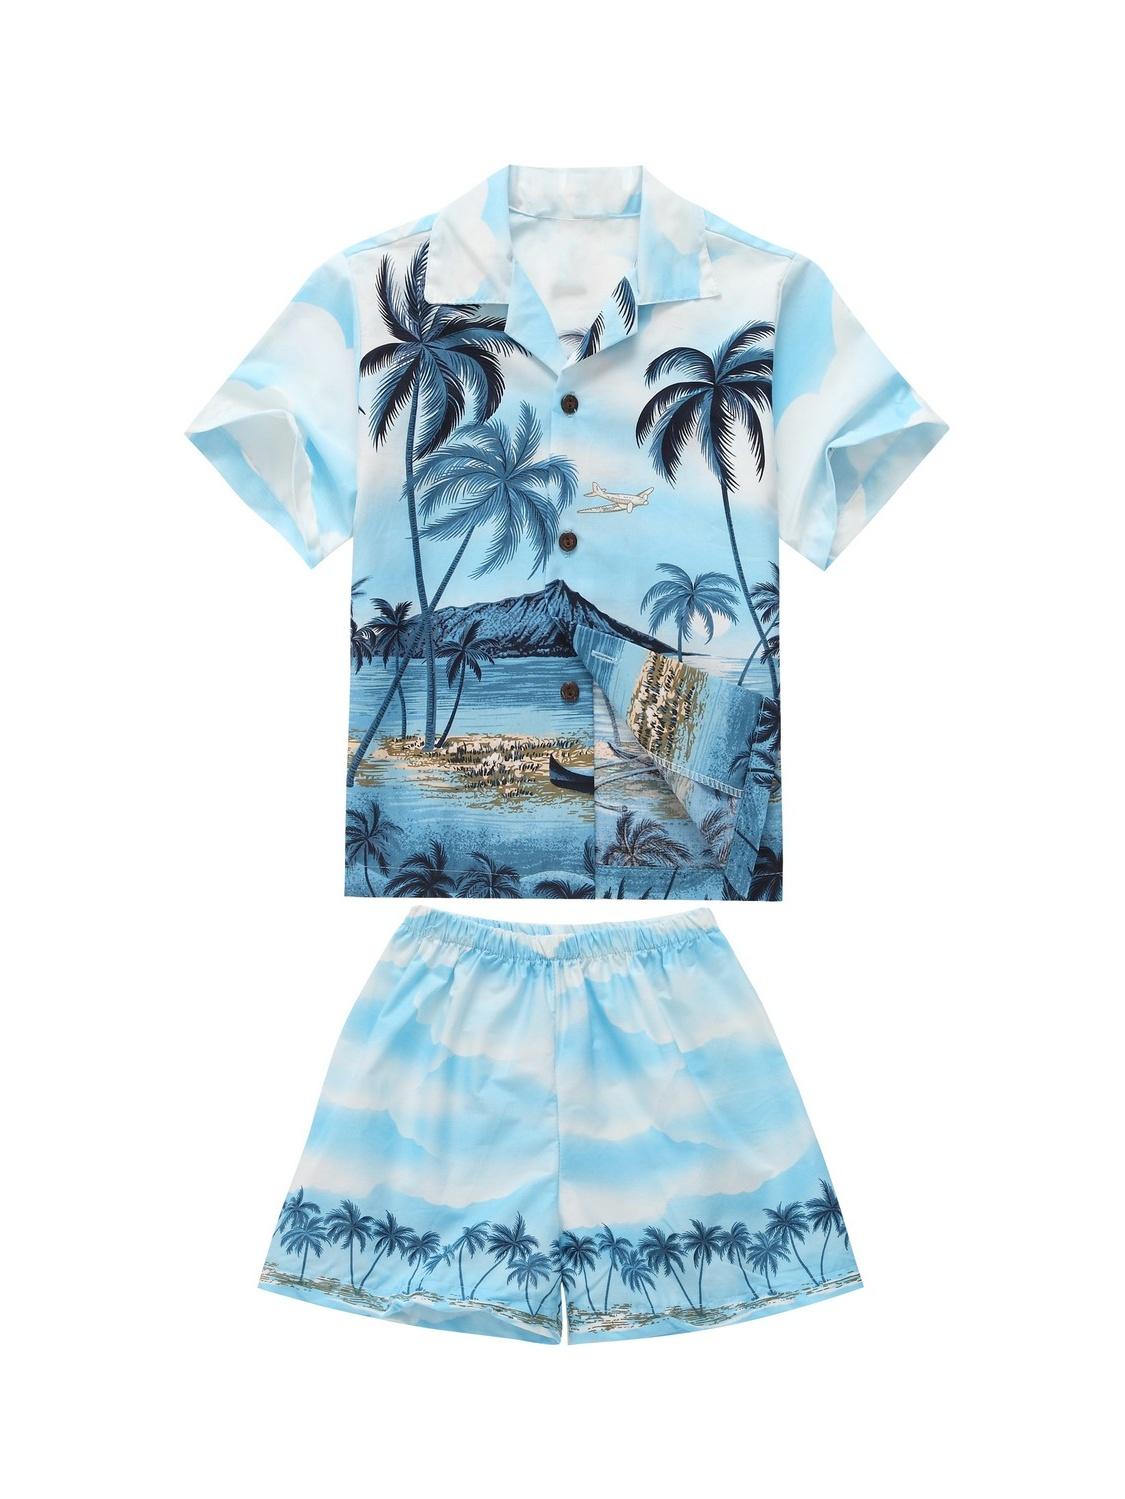 Made in Hawaii Luau Aloha Shirt and Shorts Boy Cabana Set Palm Edge Blue 6